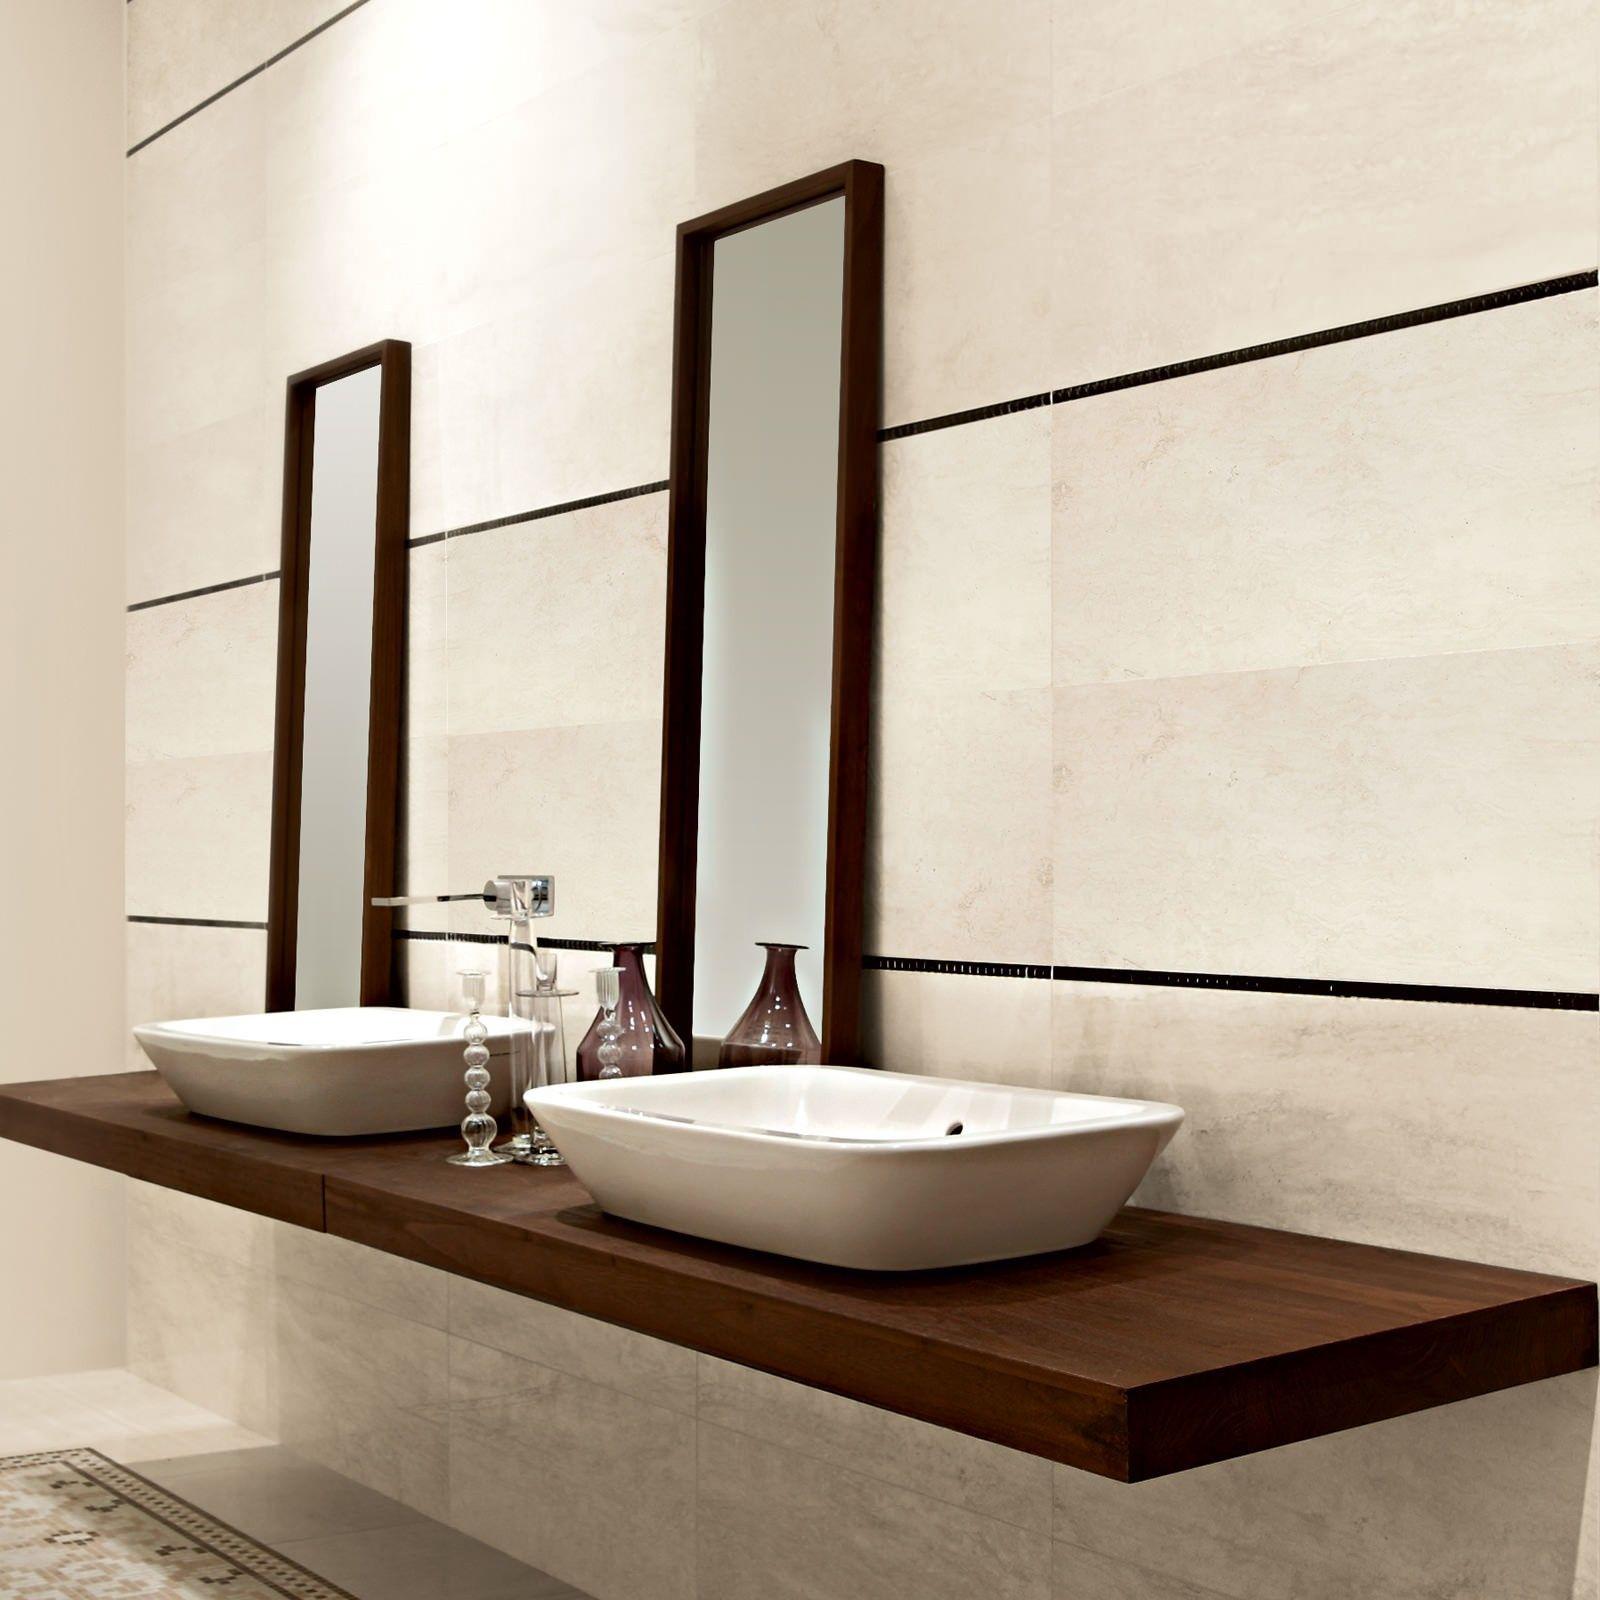 Marmo D Bianco 30.5cm x 72.5cm Tile | BH2ndBath | Pinterest ...